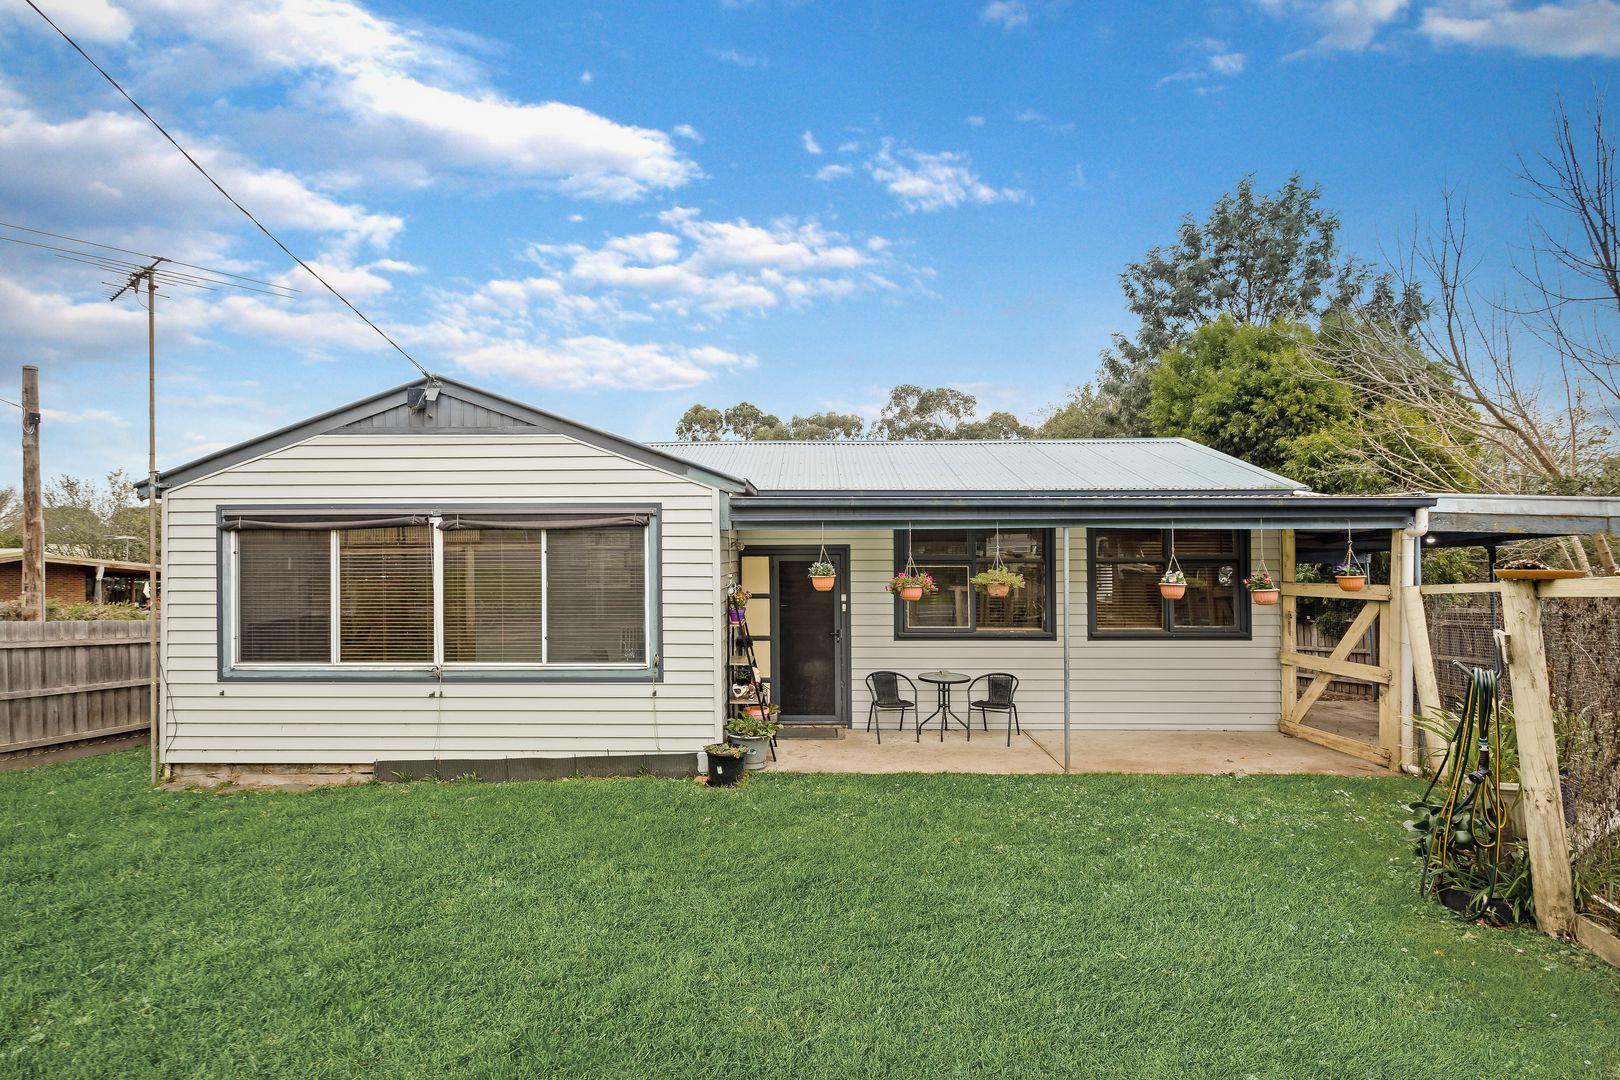 Sold 17 Maroondah Highway, Healesville VIC 17 on 17 May 17